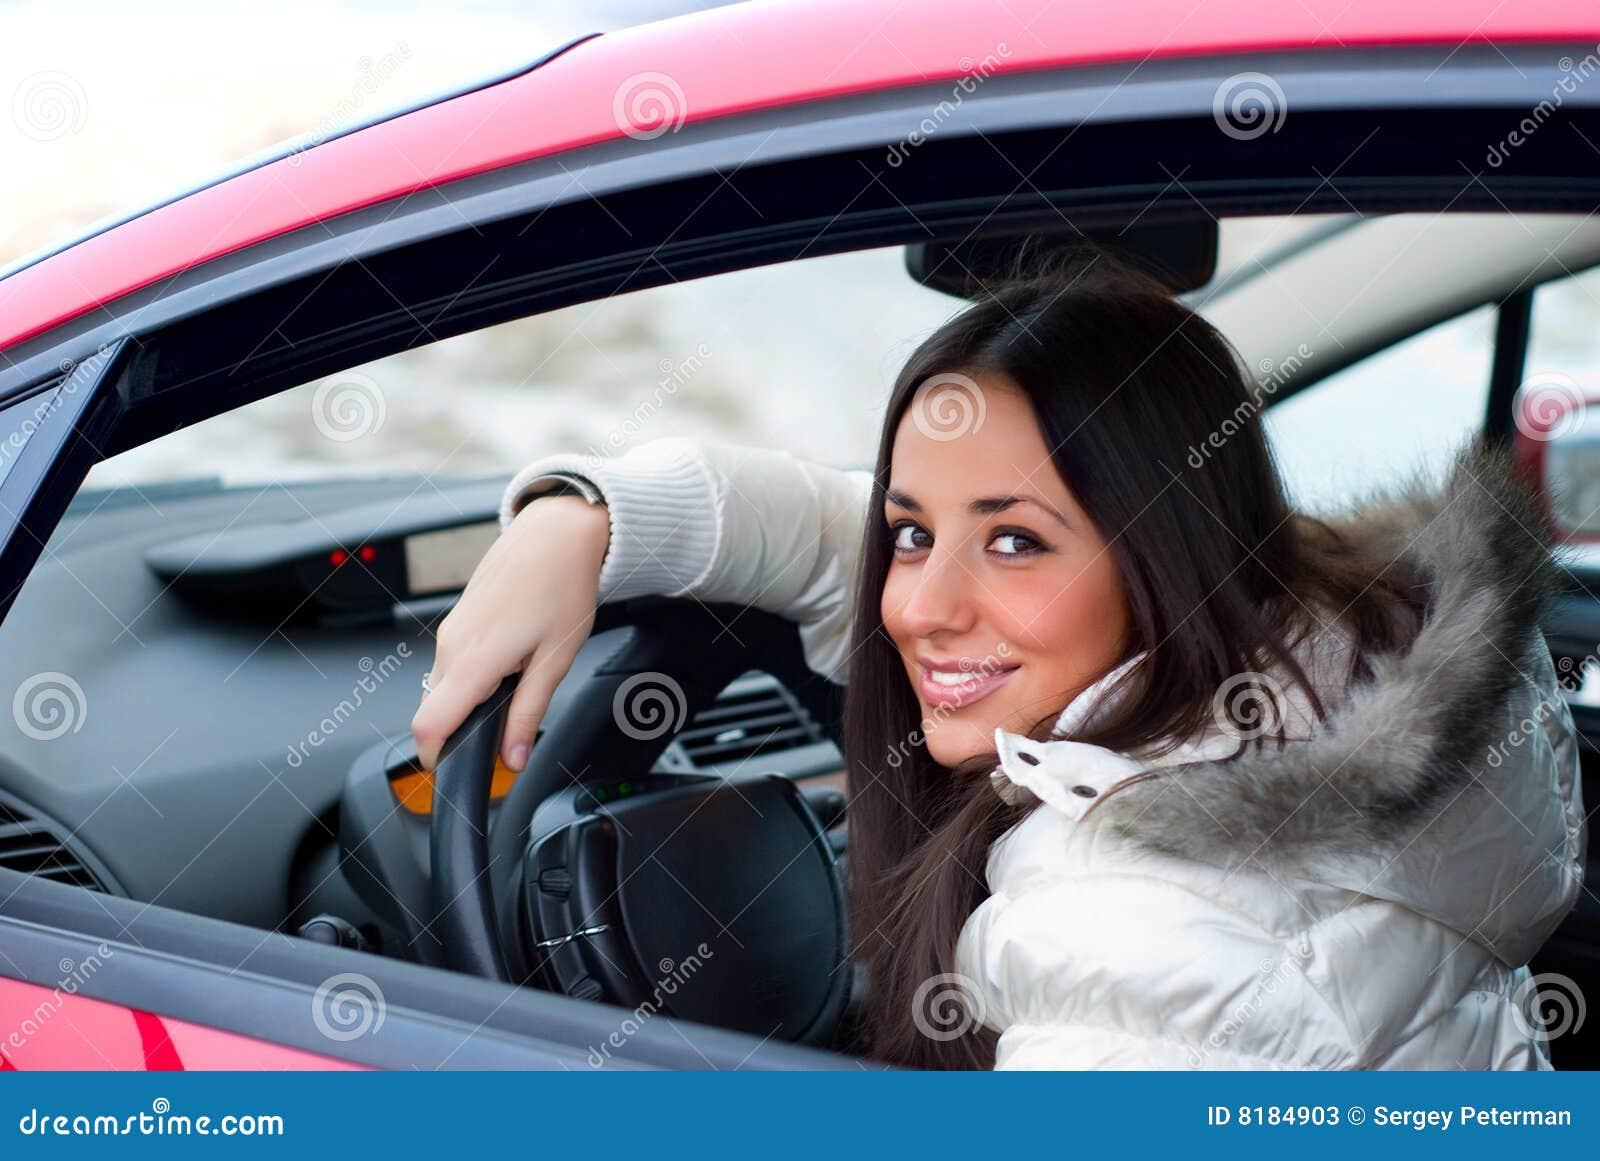 Фото девушек брюнеток за рулём 11 фотография